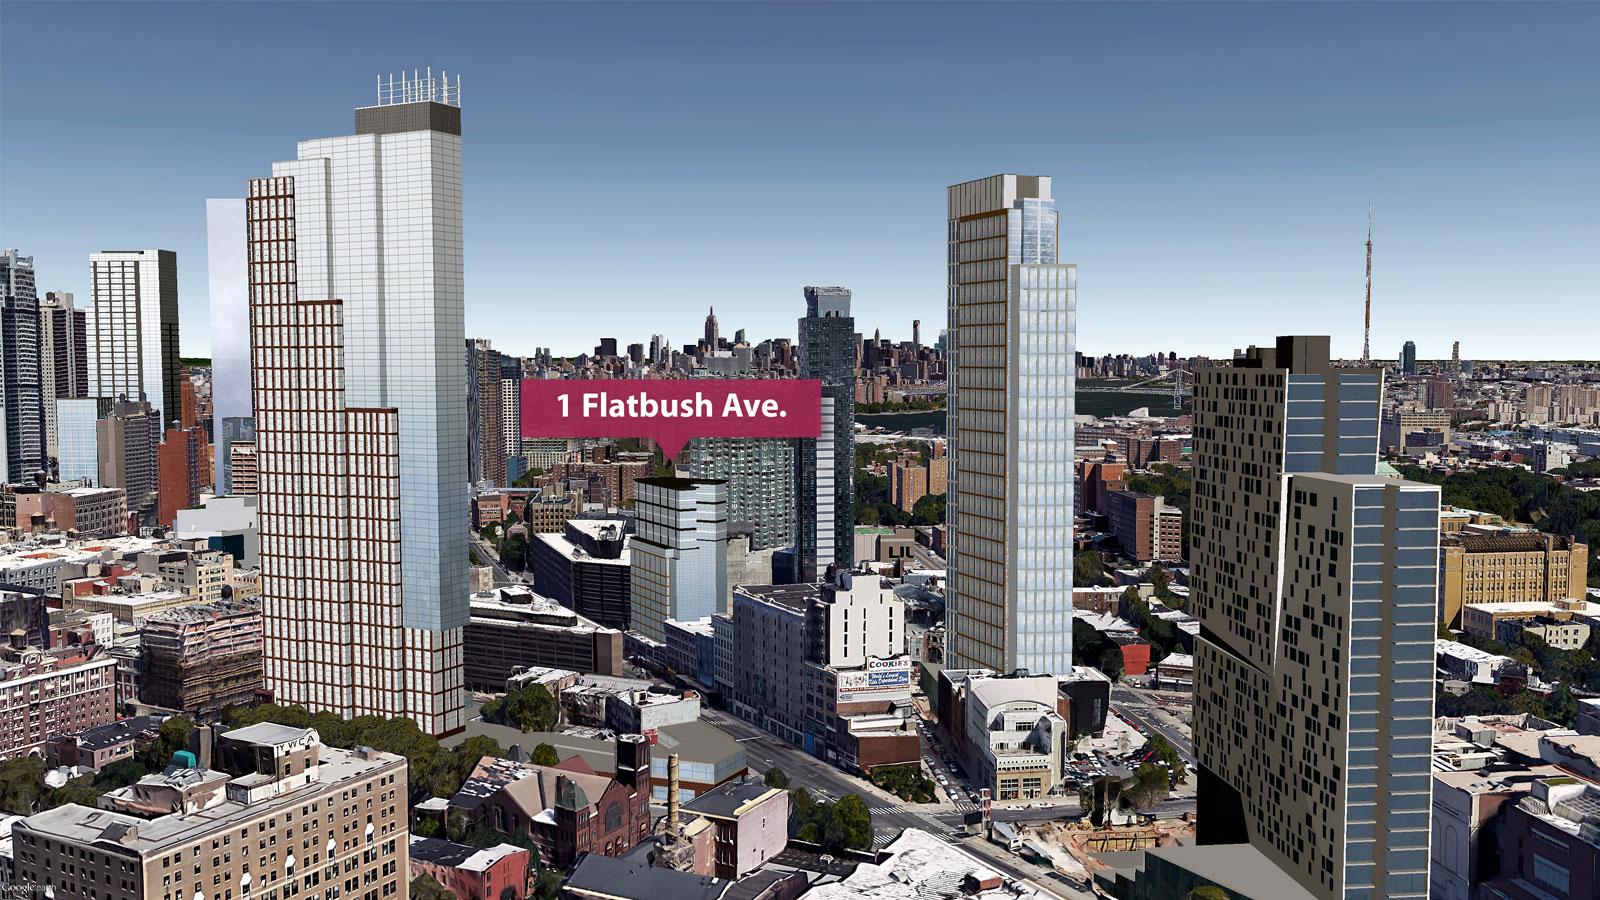 One Flatbush, 1 Flatbush Avenue